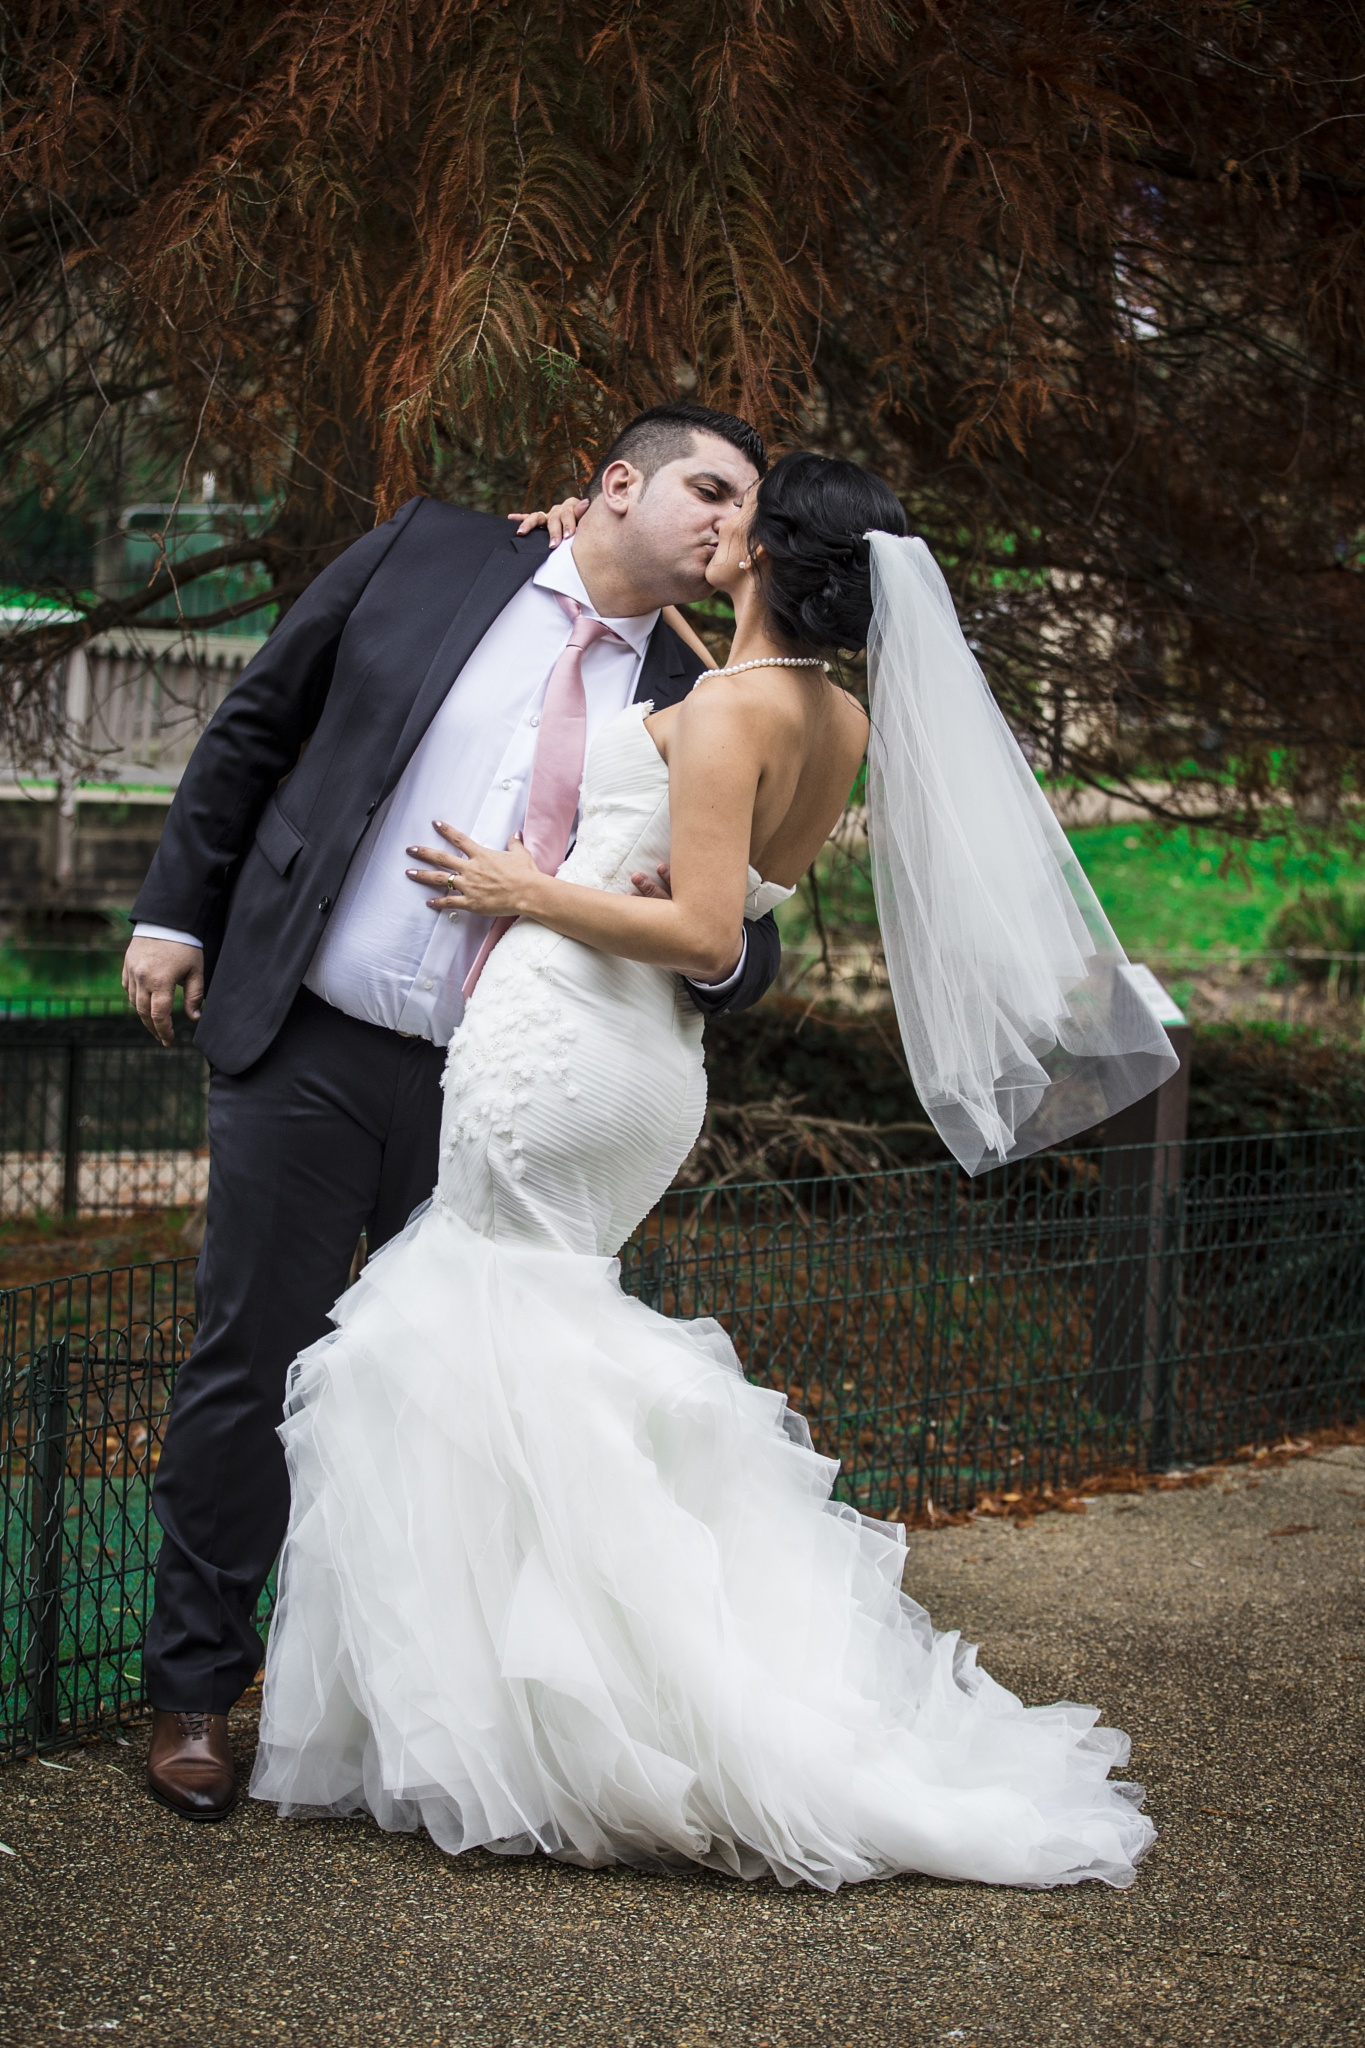 Wedding Love by paulinecheyrouze3